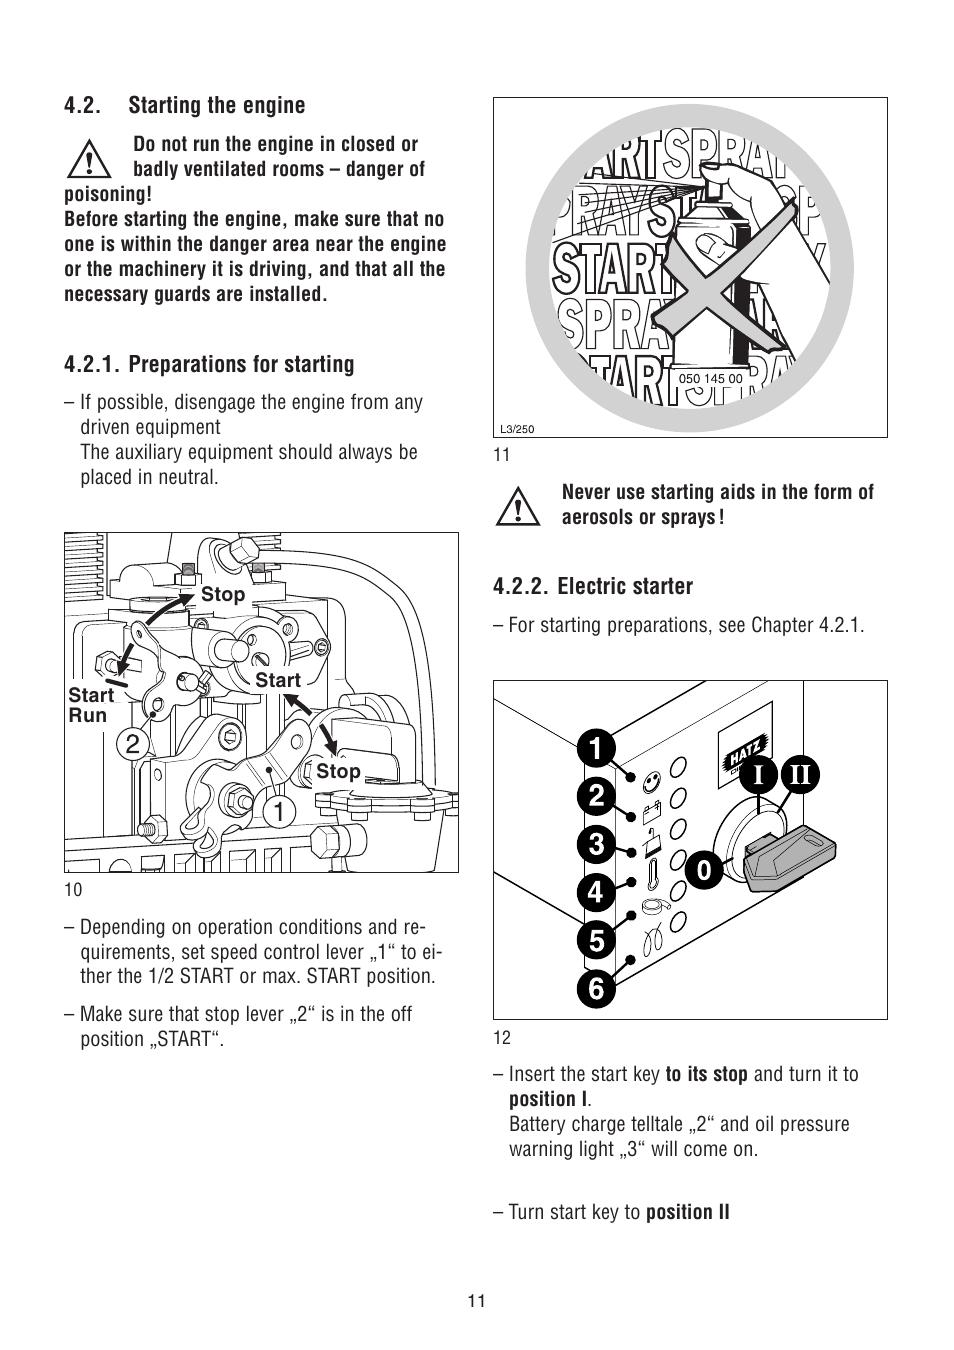 6l Mfi Dohc 4cyl Repair Guides Wiring Diagrams On Kia Rio 1 6l Engine